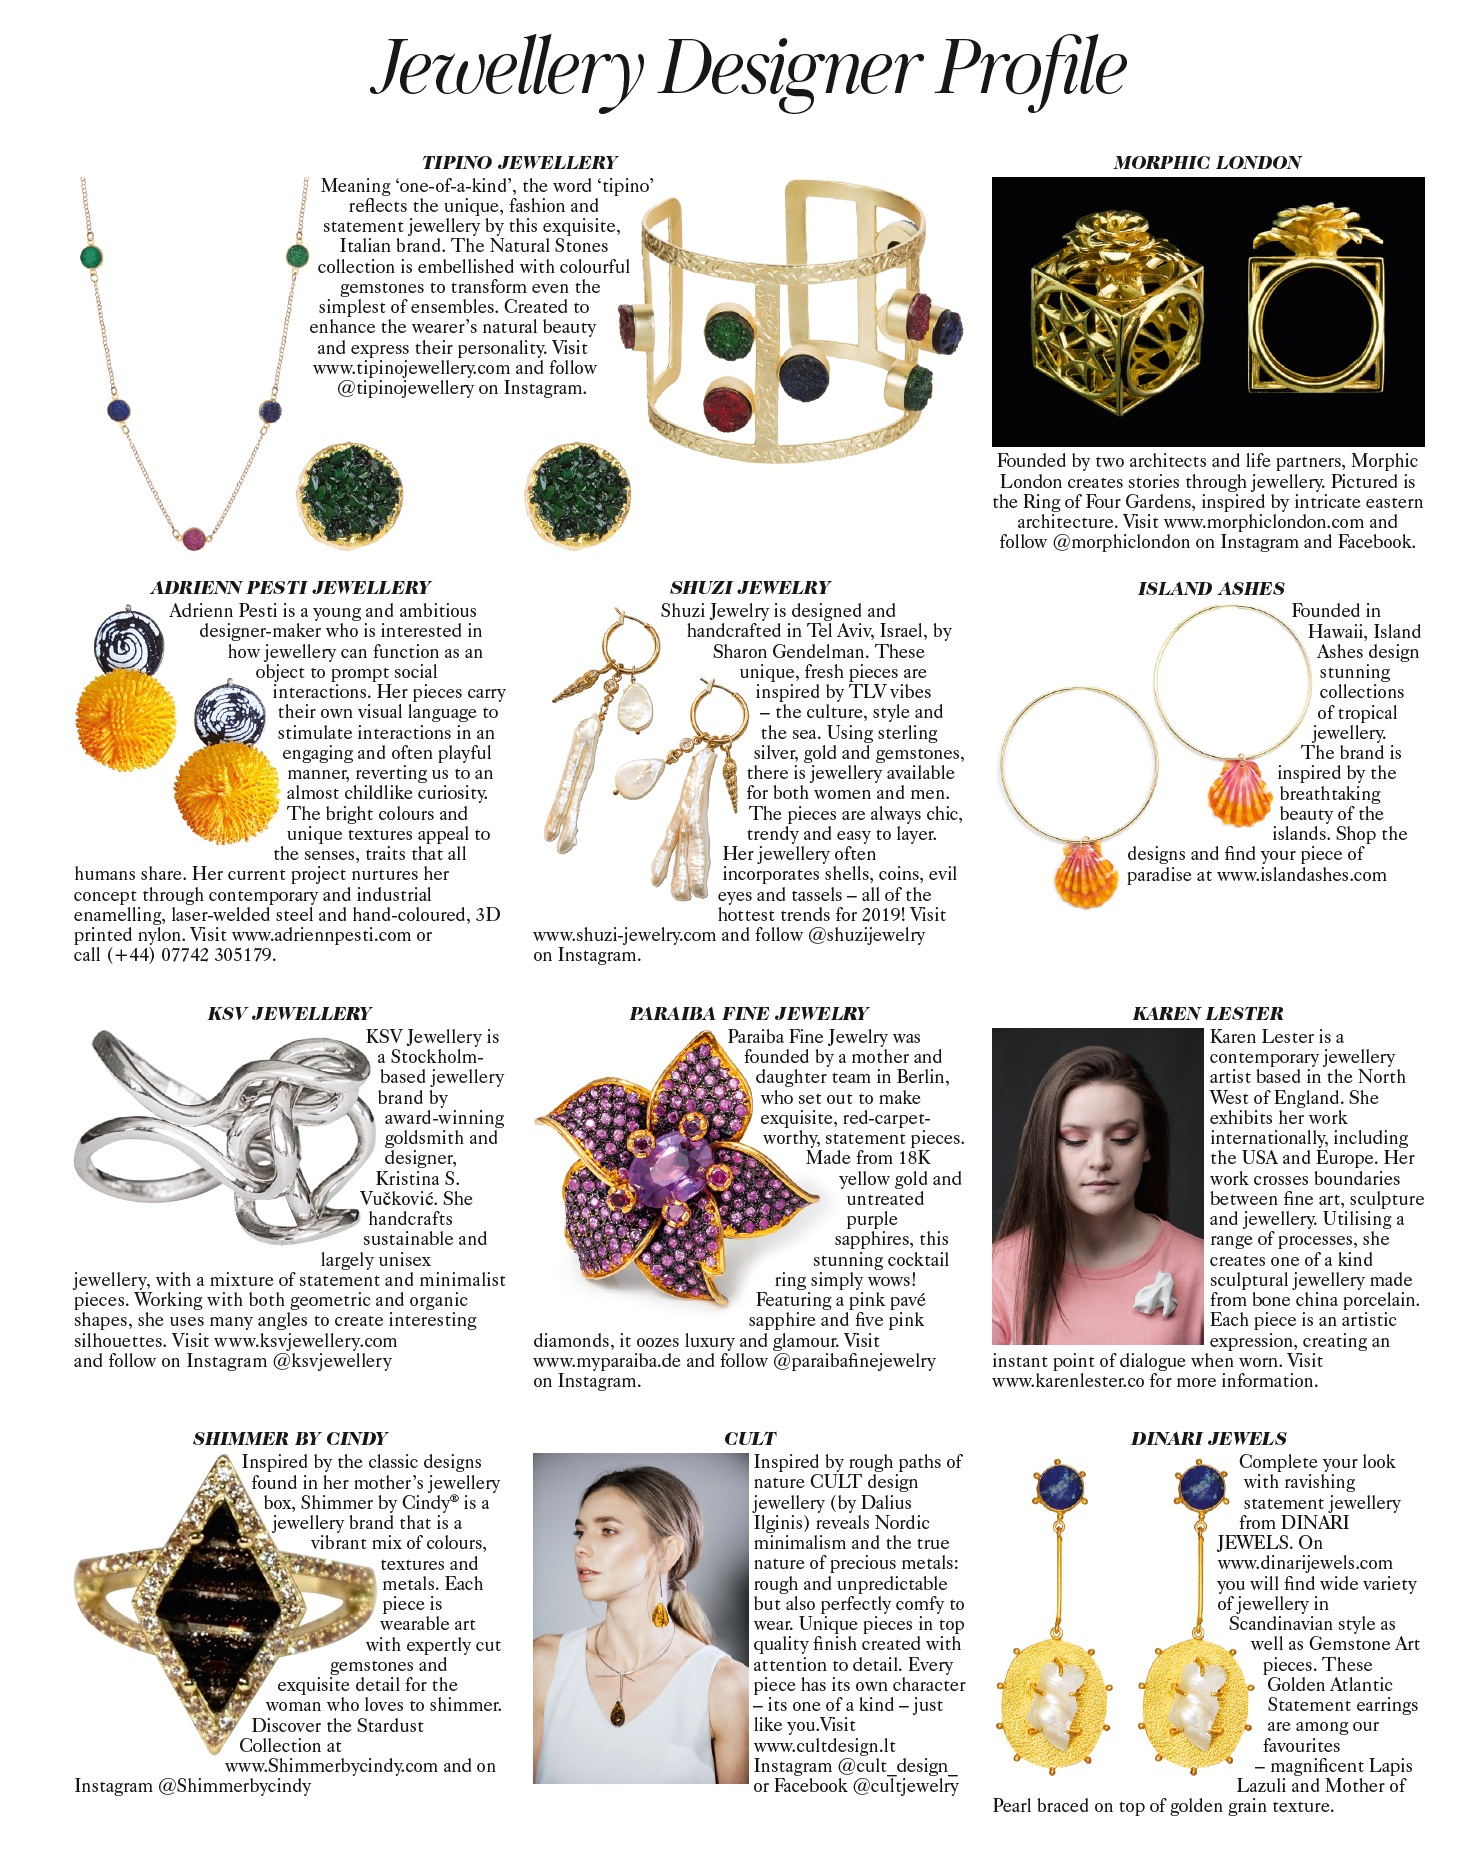 236 Jewellery Designer Profile.png